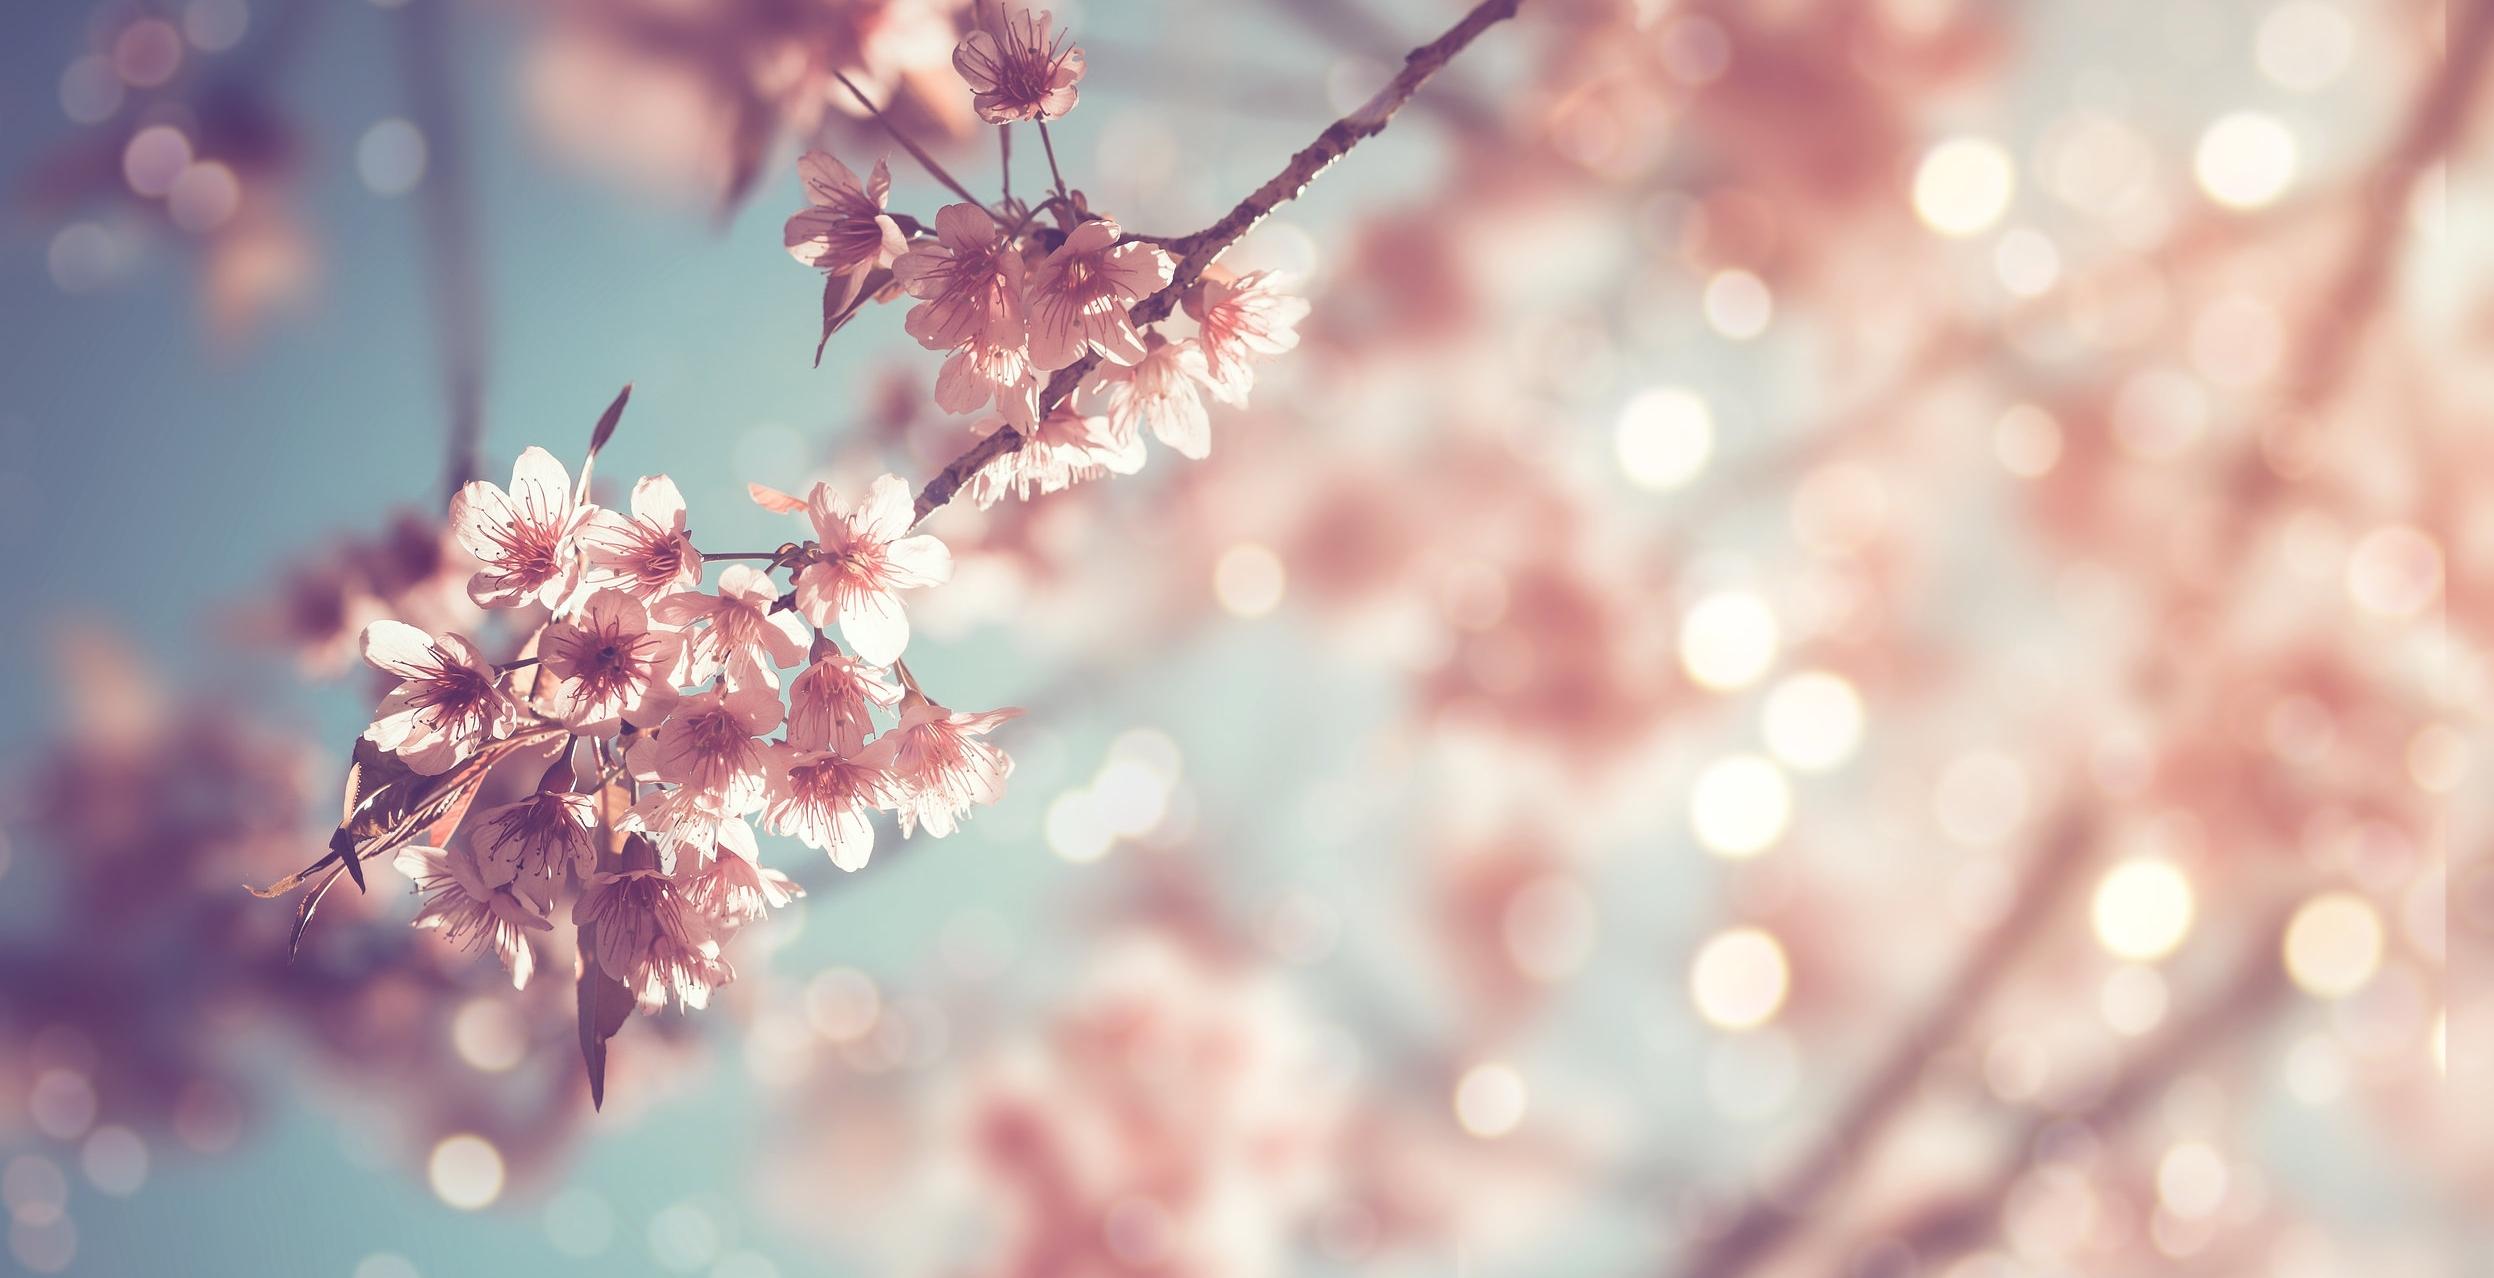 Aromatherapy flowers in Bristol